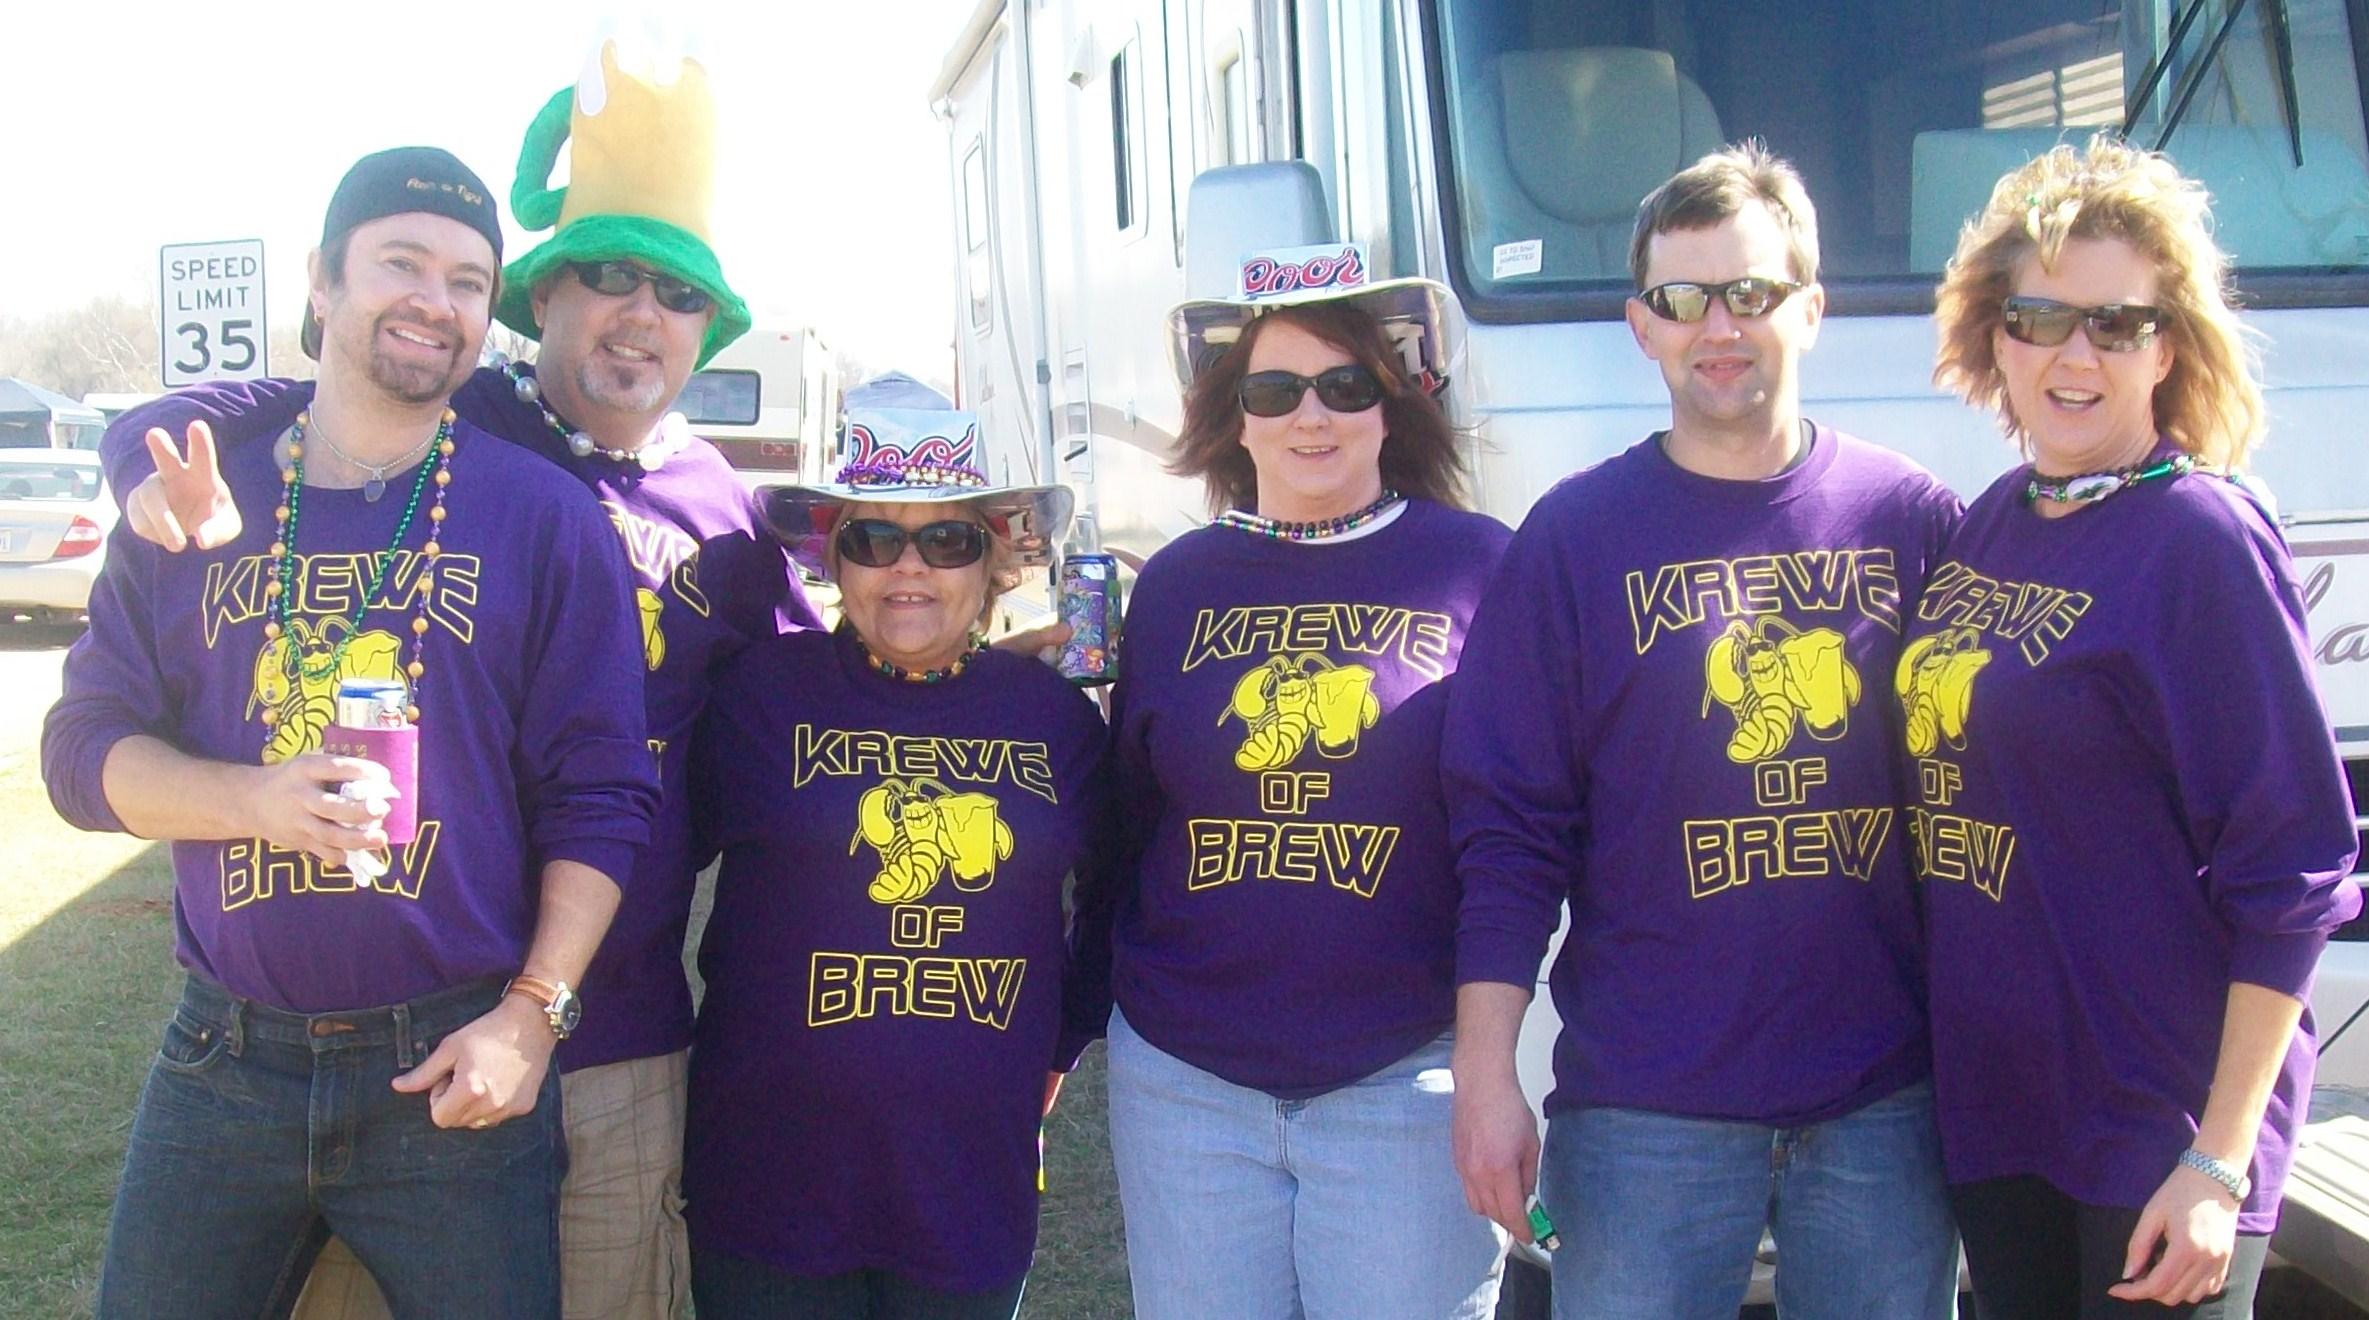 T shirt design huntsville al - Mardi Gras 2009 T Shirt Photo